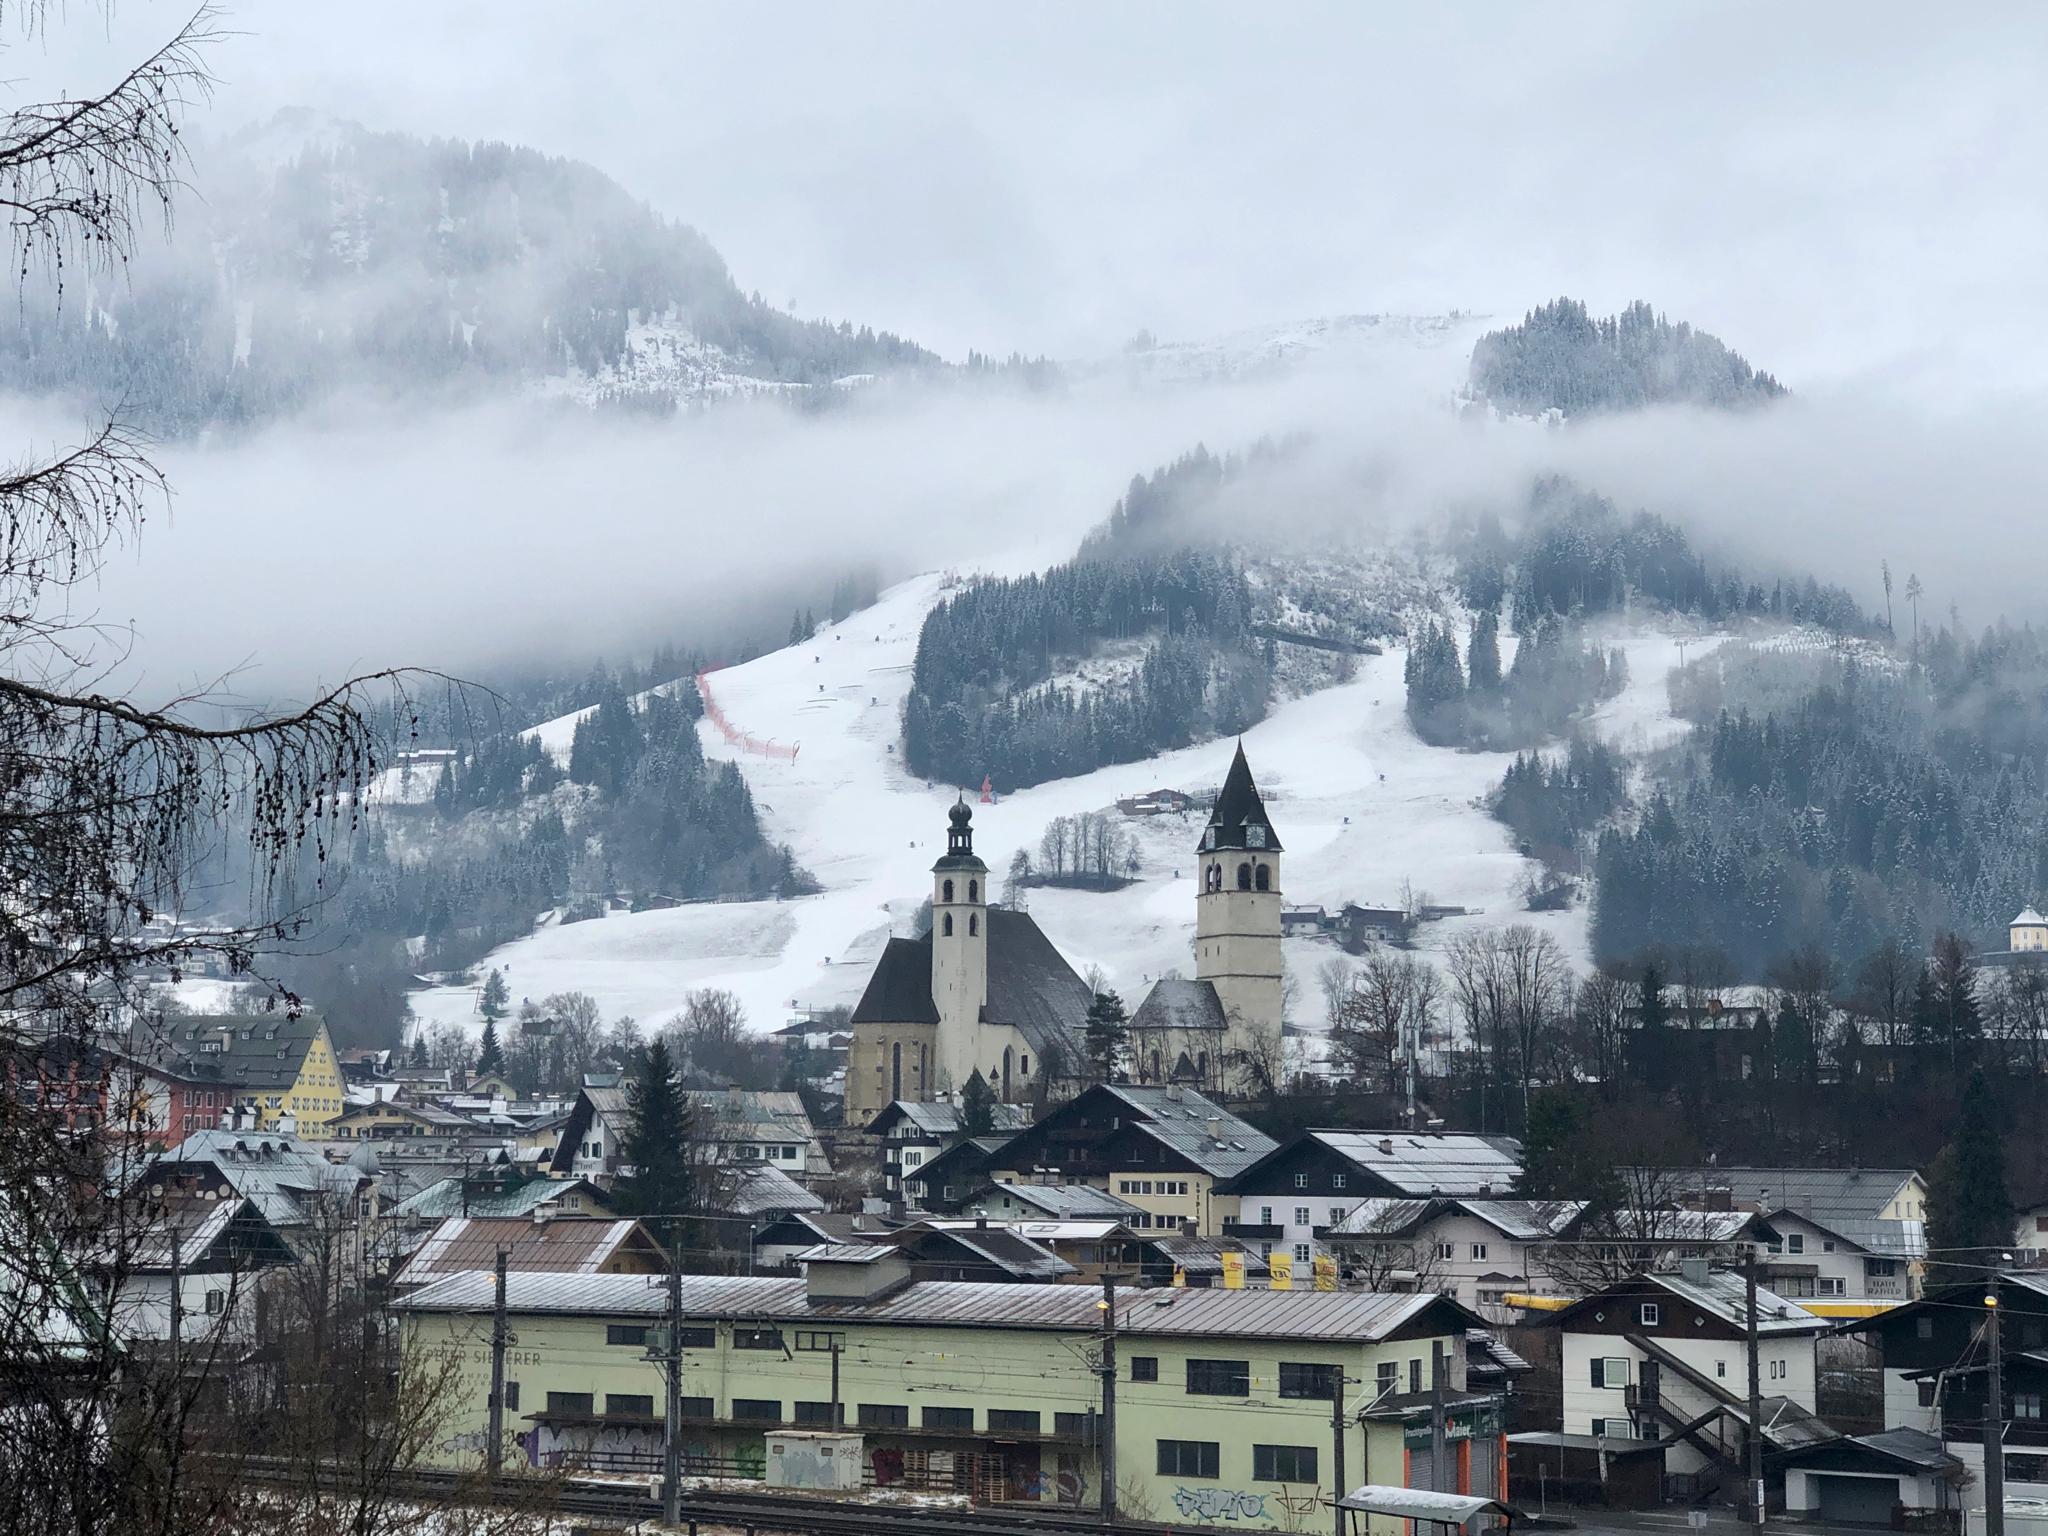 Hahnenkamm in Kitzbühel